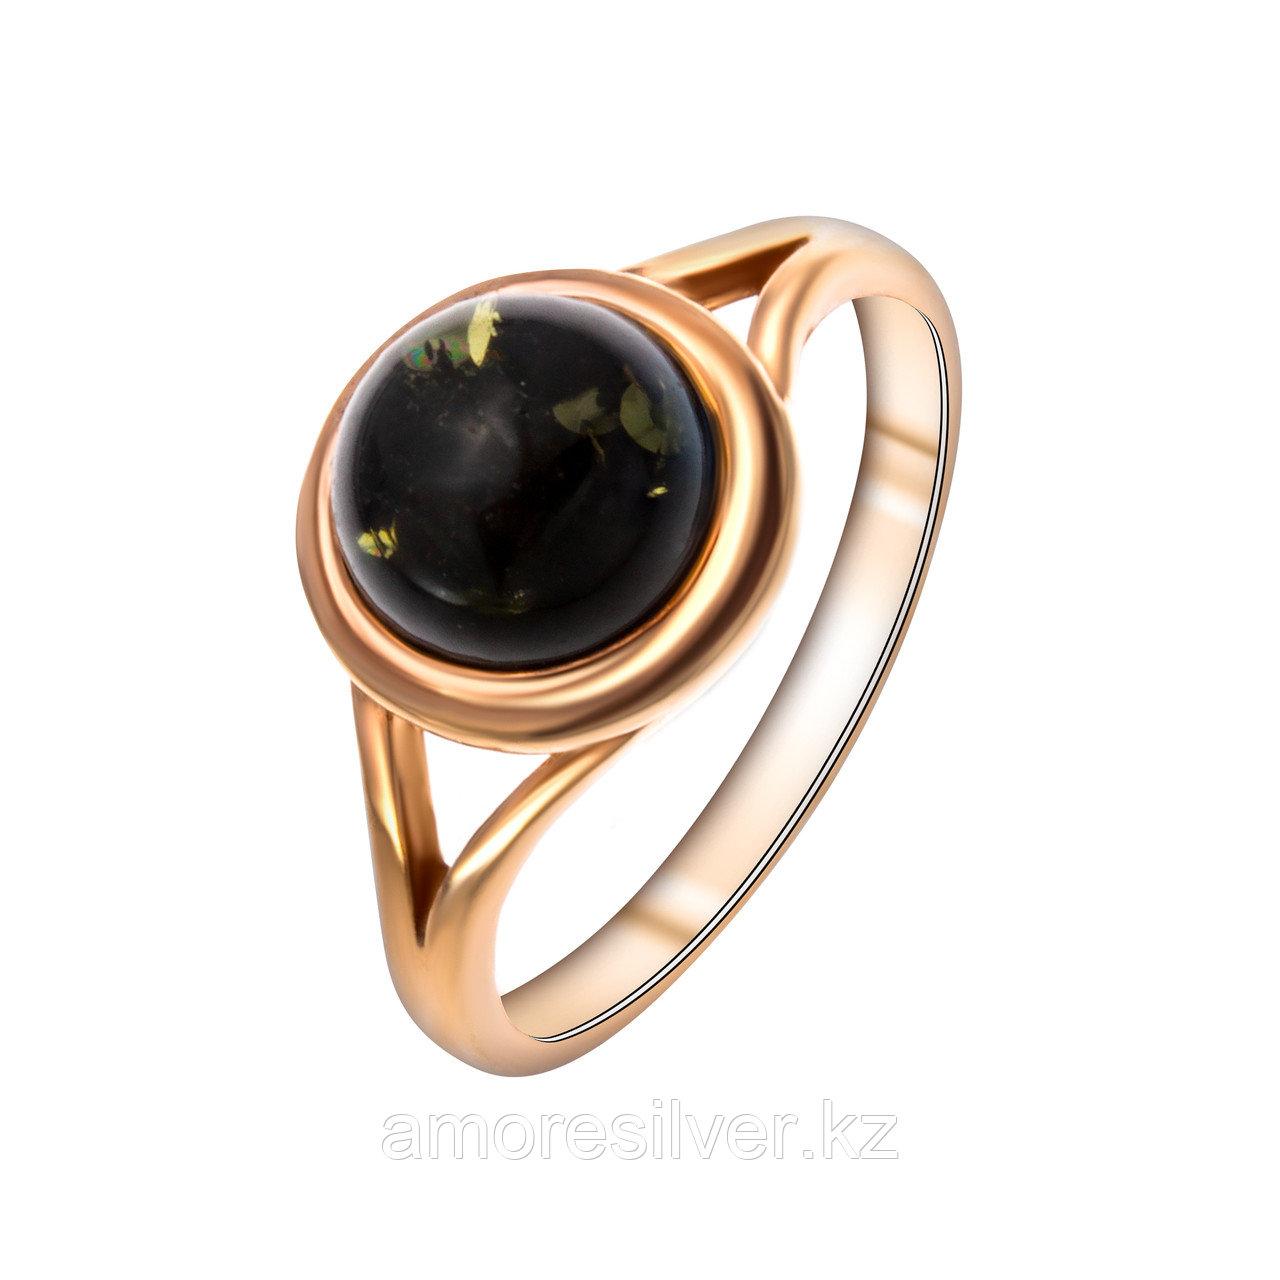 Кольцо ЯНТАРНАЯ ЛАГУНА серебро с позолотой, янтарь, круг 4LP073 размеры - 18 18,5